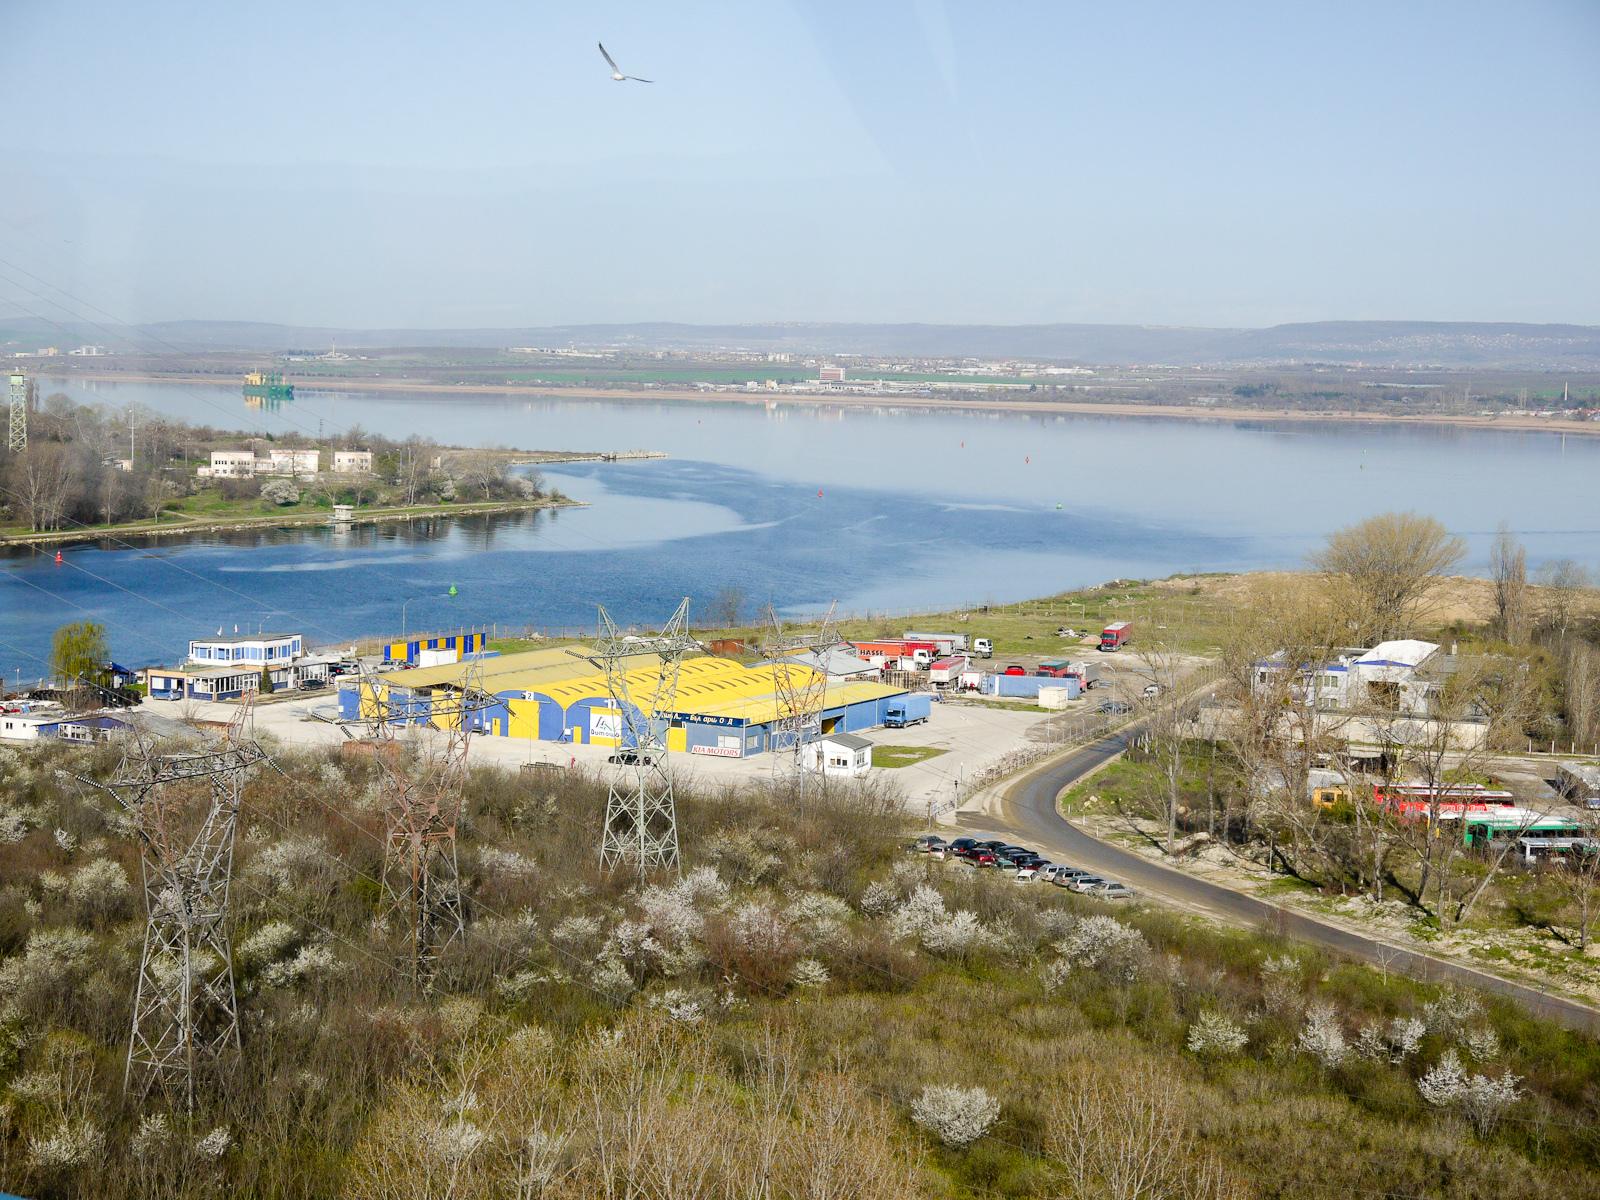 Варненское озеро, Болгария